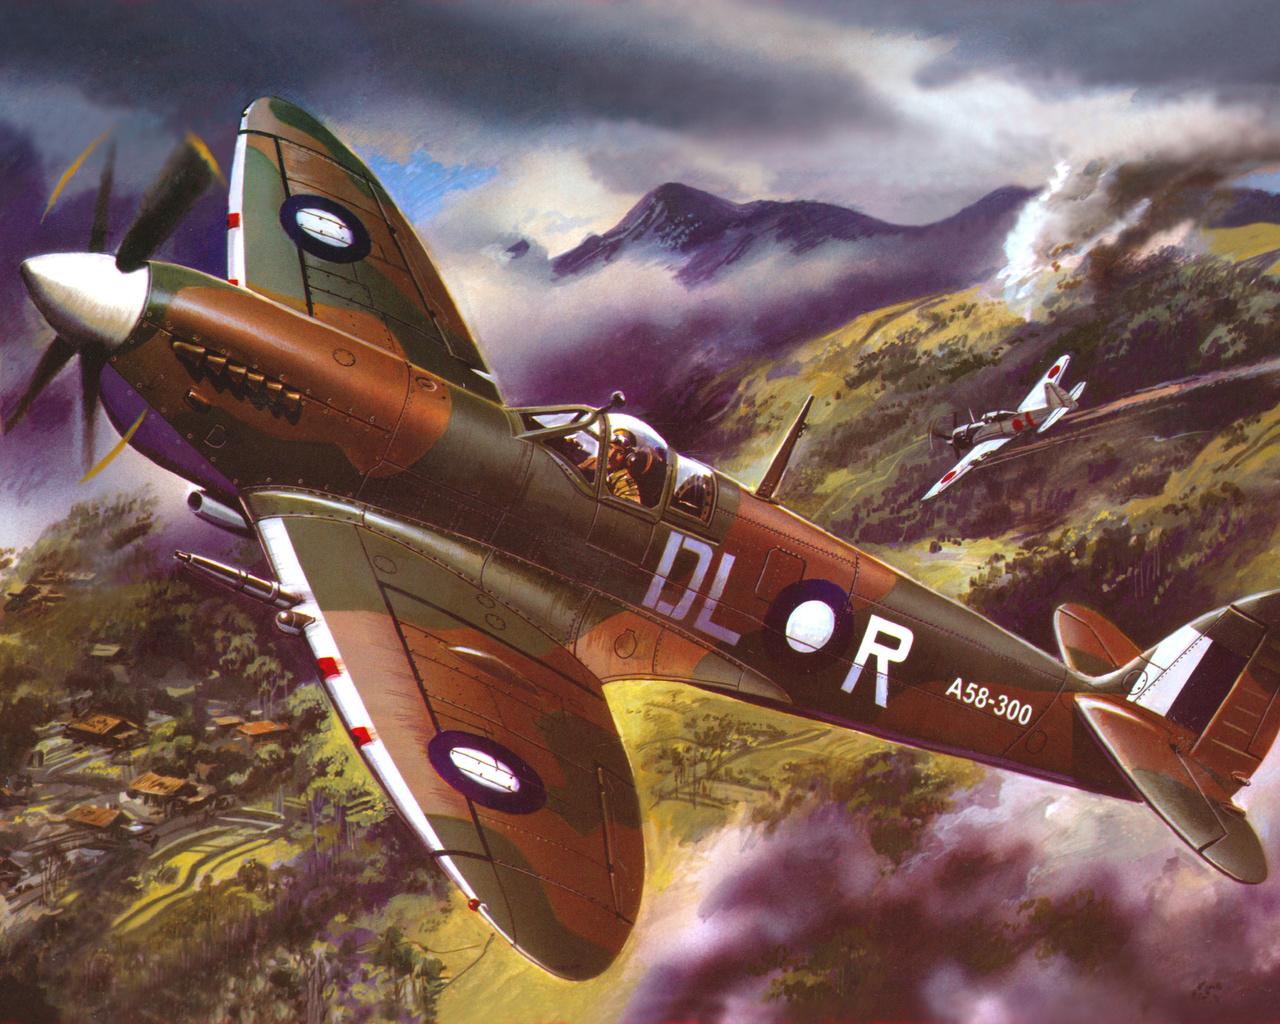 небо, Арт, истребитель, английский, спитфайр - 8, supermarine, spitfire, mk viii, lf, raaf, 54sqn, австралия, zero, a6m